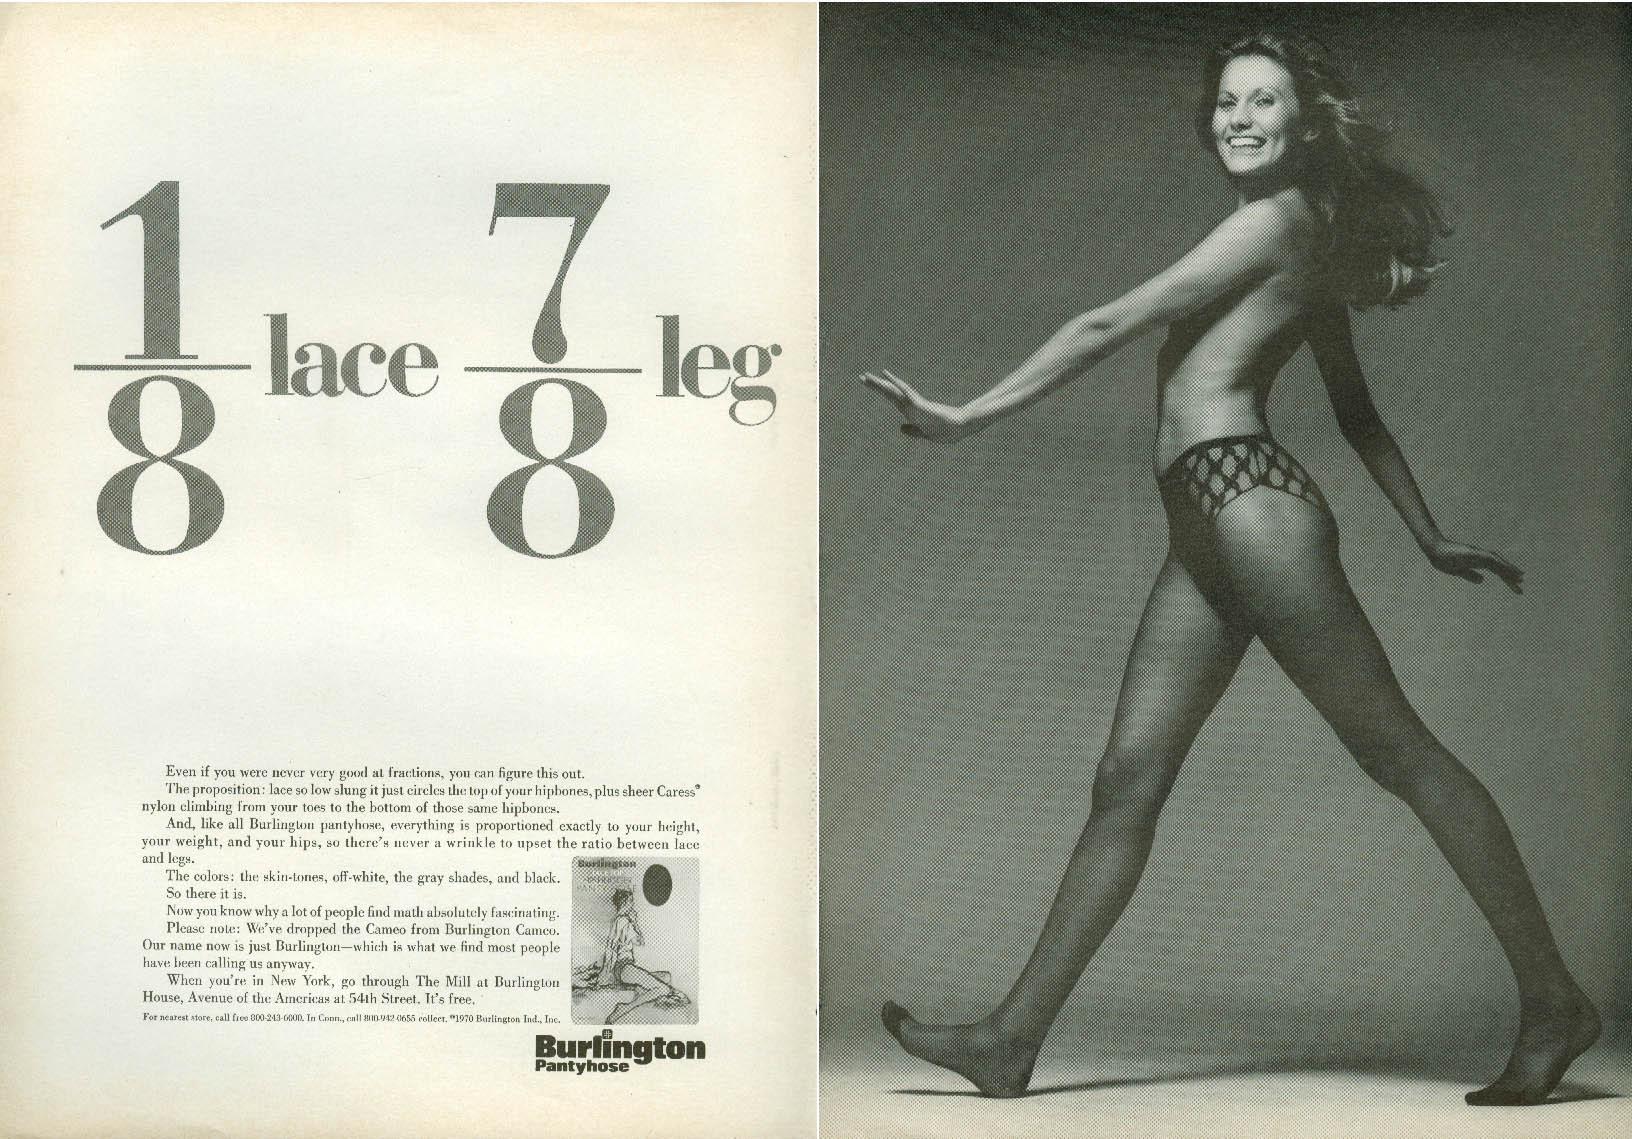 pantyhose leg ads